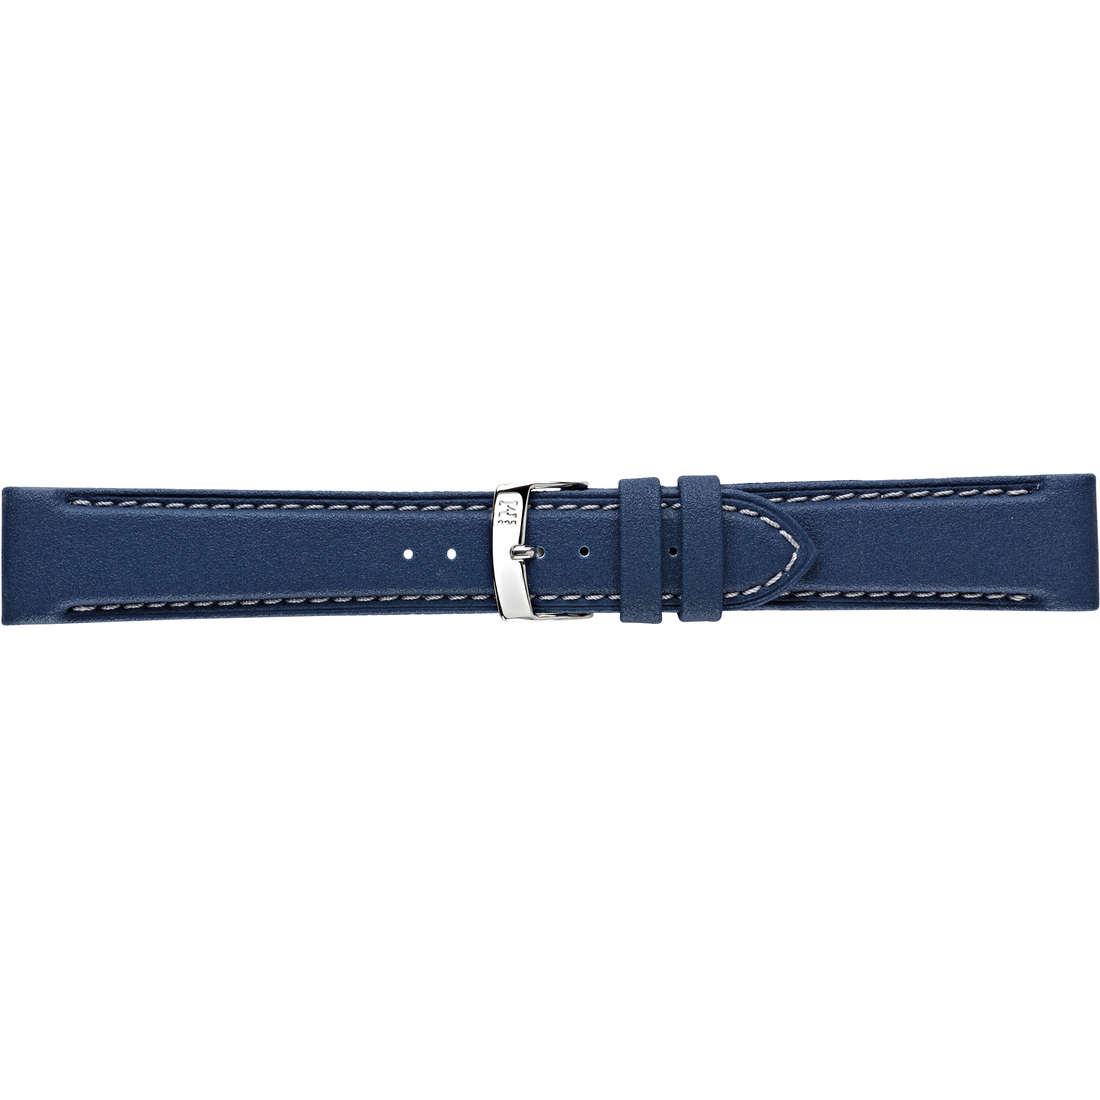 watch watch bands watch straps man Morellato Linea Sport A01U3822A42062CR20